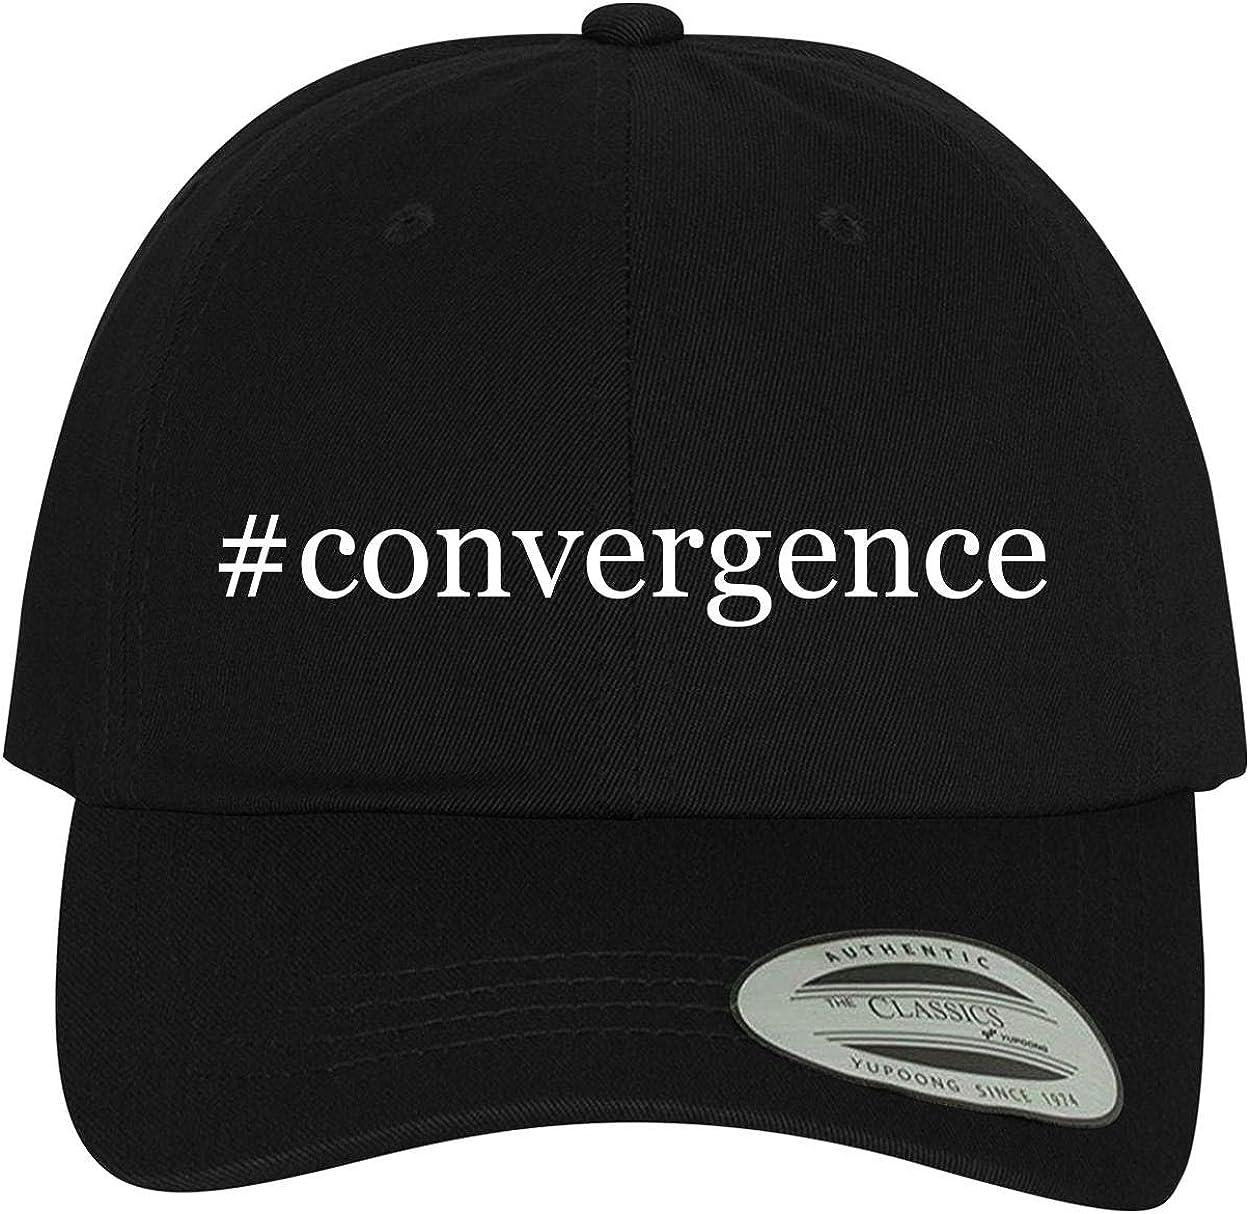 Comfortable Dad Hat Baseball Cap BH Cool Designs #Convergence